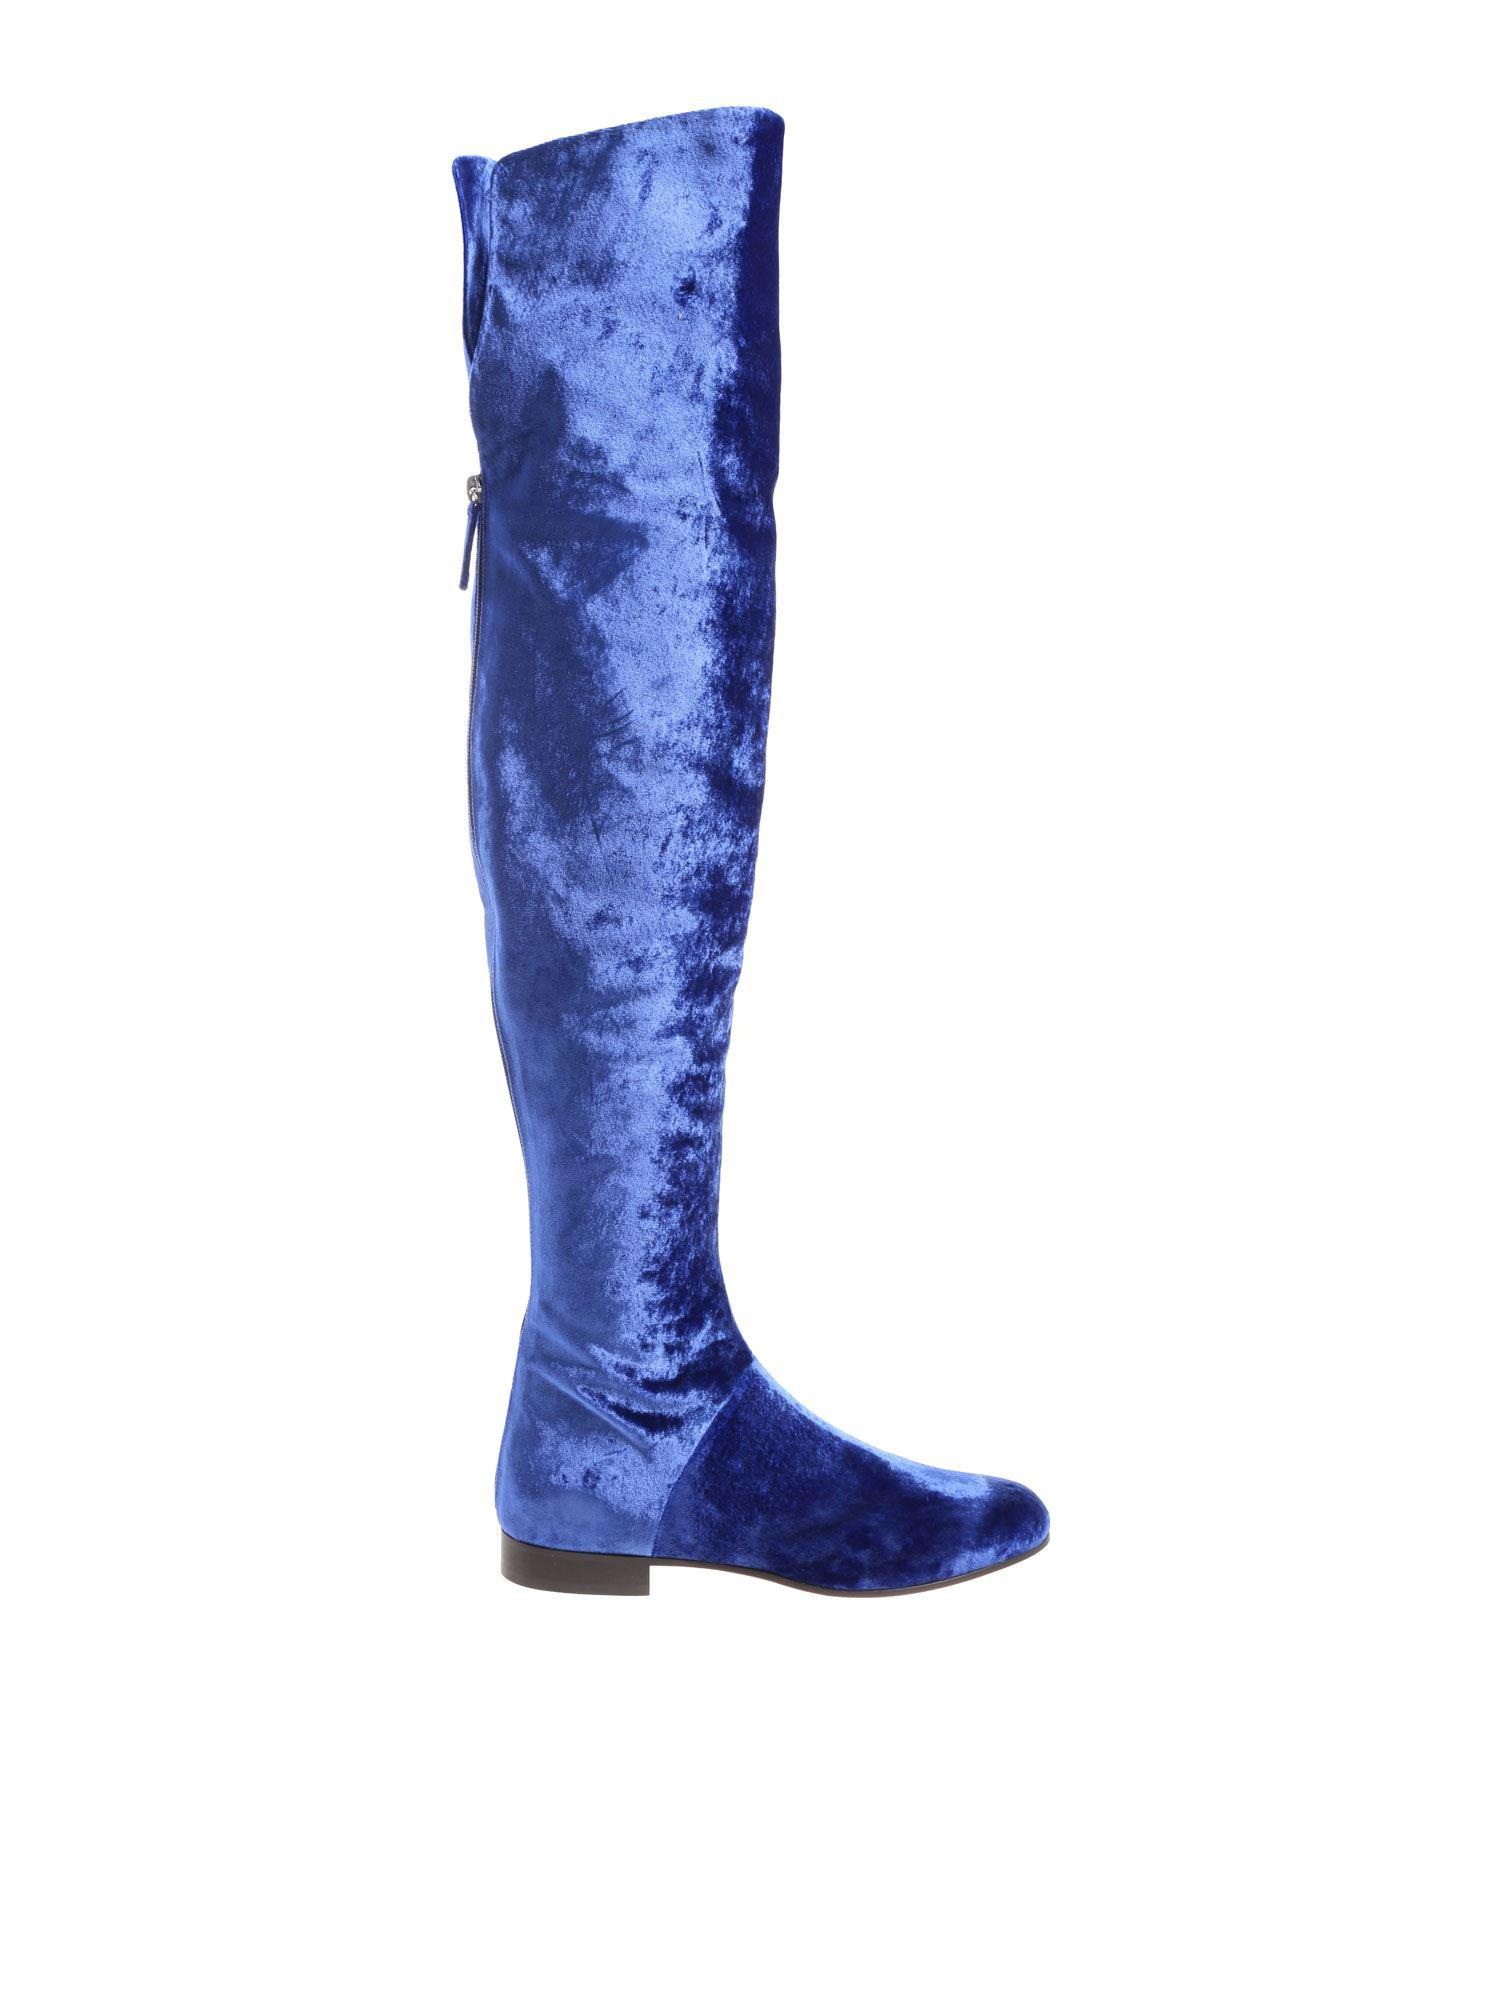 fbc40d60626 Lyst - Alberta Ferretti Electric Blue Velvet Boots in Blue